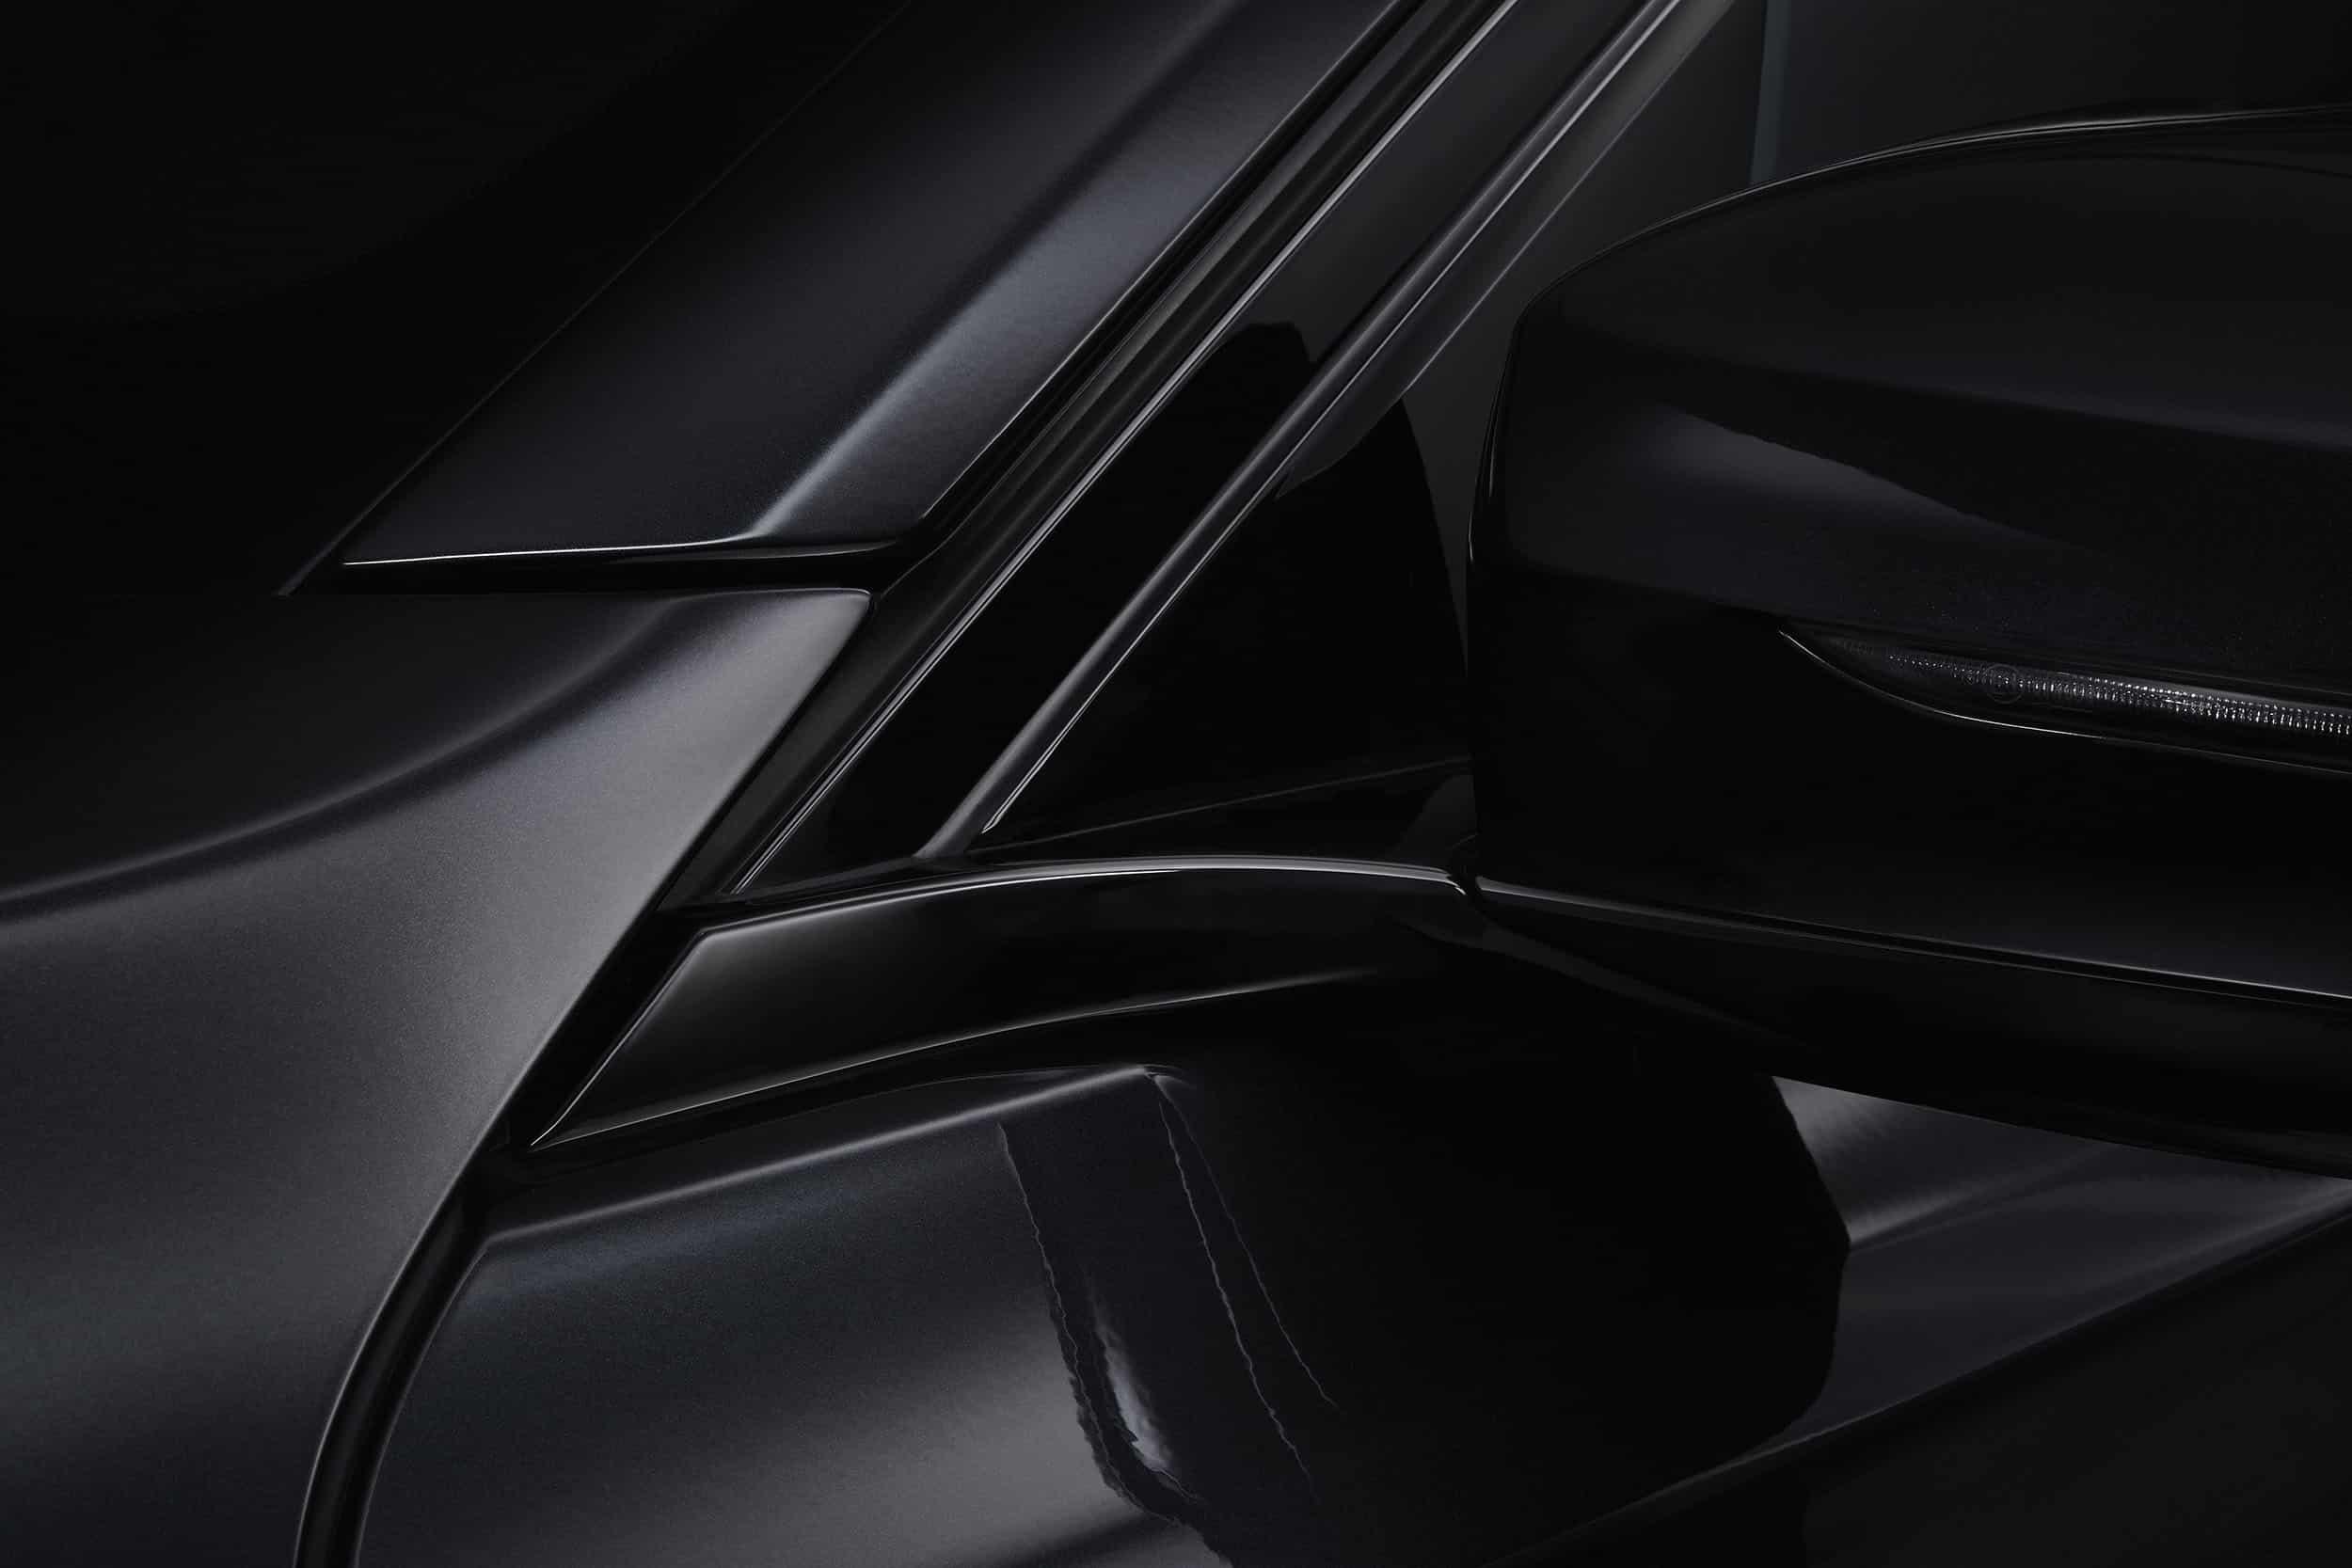 studio-ignatov-wkw-automotive-imagekampagne-bw-06